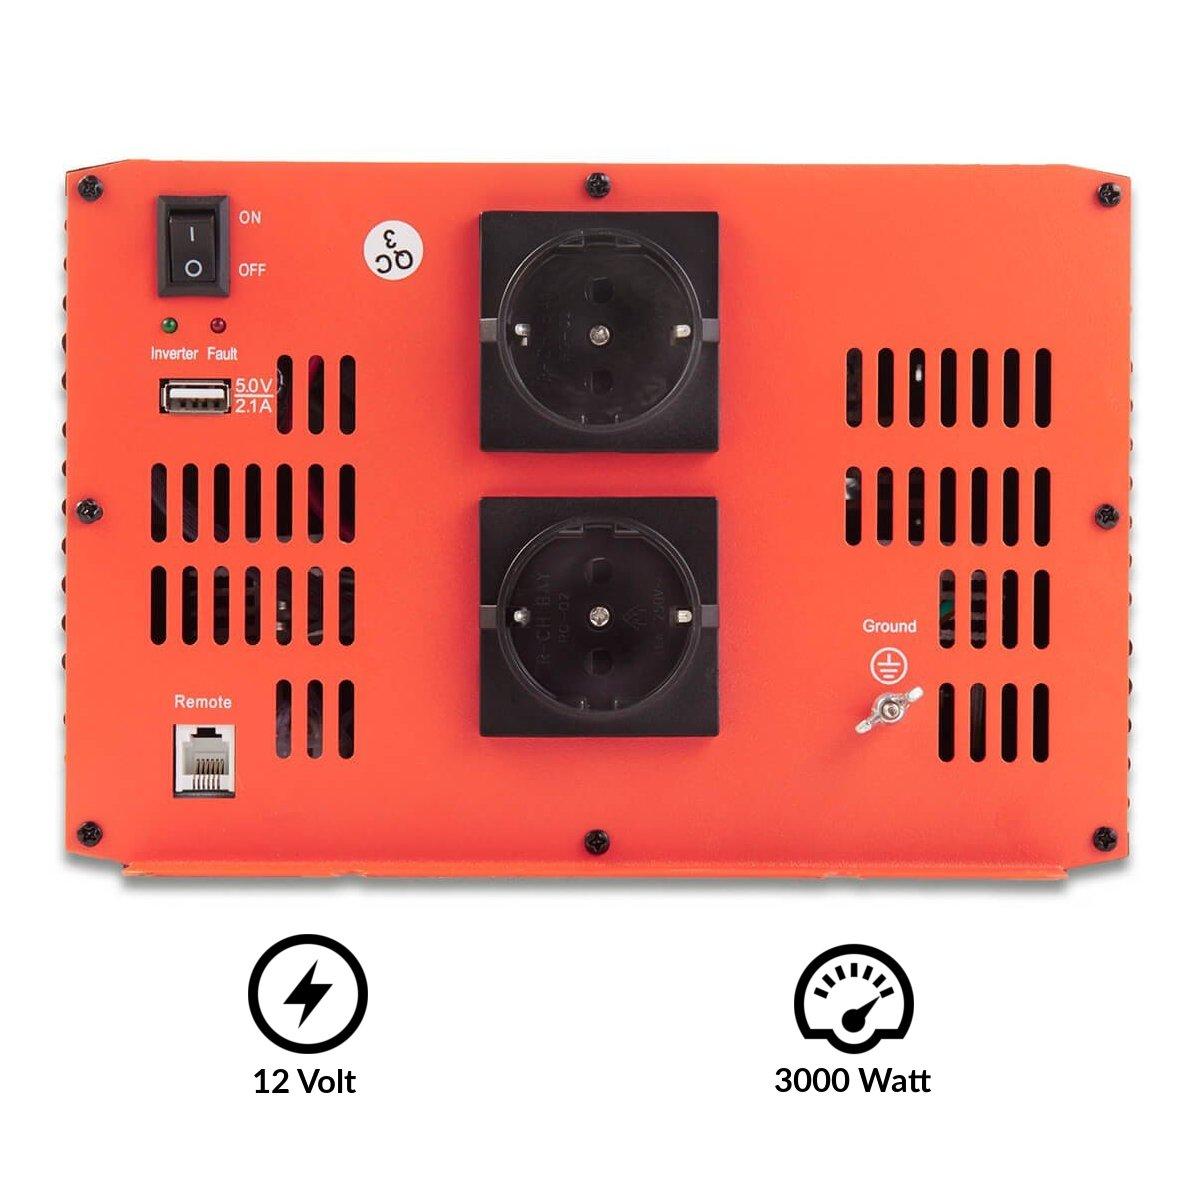 ECTIVE Serie SI caz | Inversor de onda sinusoidal 12V a 230V | 3000W | Los transformadores de tensión, transformadores de corriente, convertidor de energía, ...